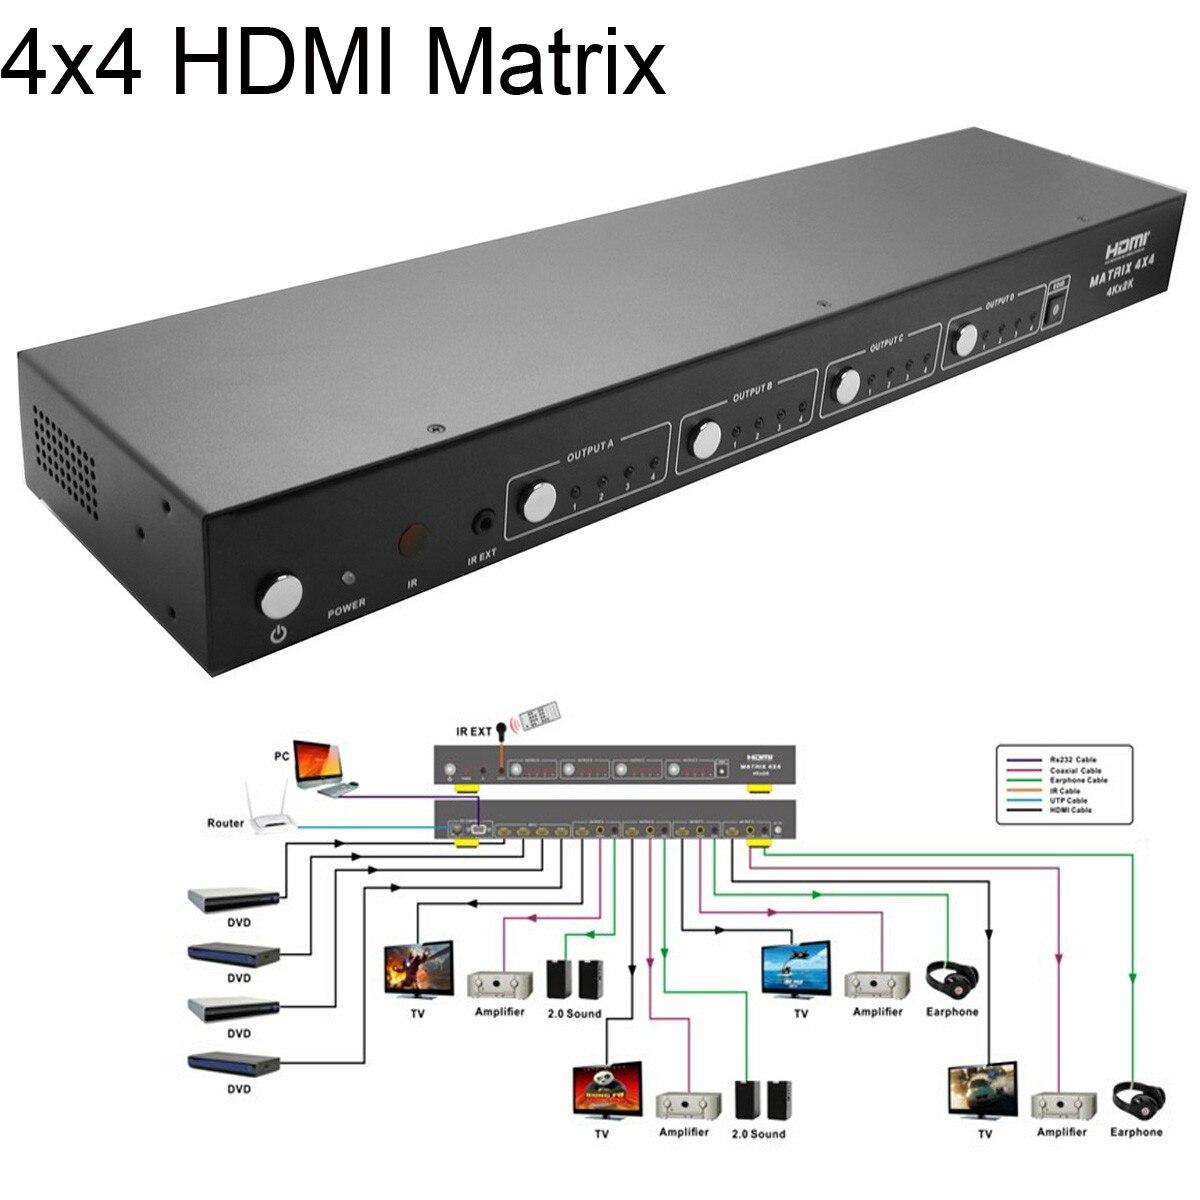 HDMI Matrix 2.0 HDMI 4X4 Swither Splitter 4kx2k 3D HDTV audio video Receiver 4 input 4 output with HDCP 2.2,ARC,IR,RS232_DHL